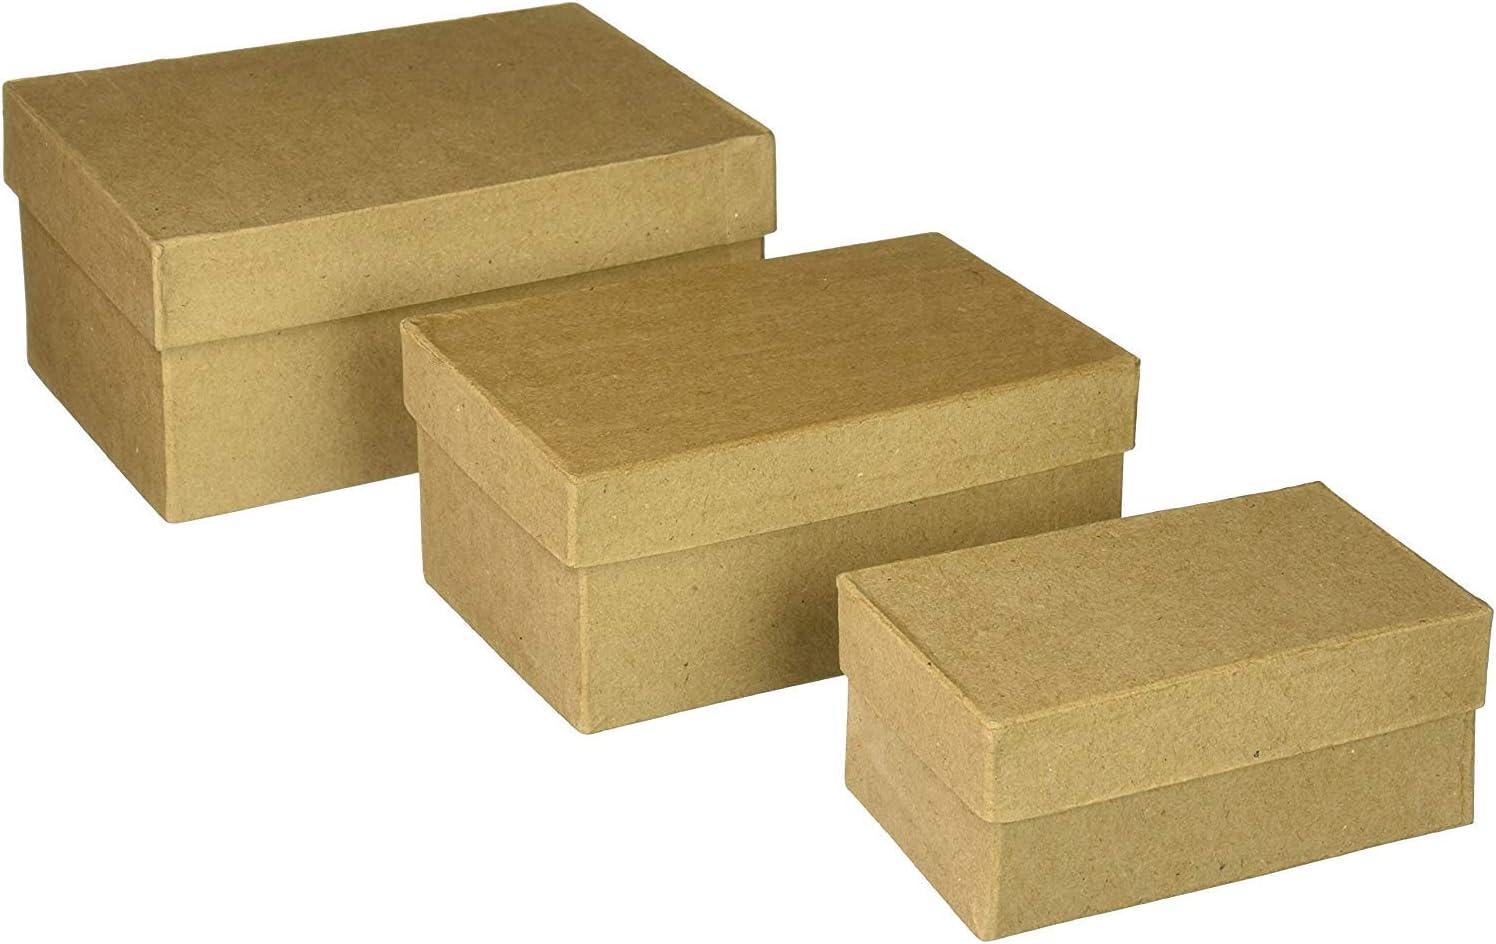 Rectangular Origami Box (downloaded)   Origami diagrams, Origami ...   948x1500